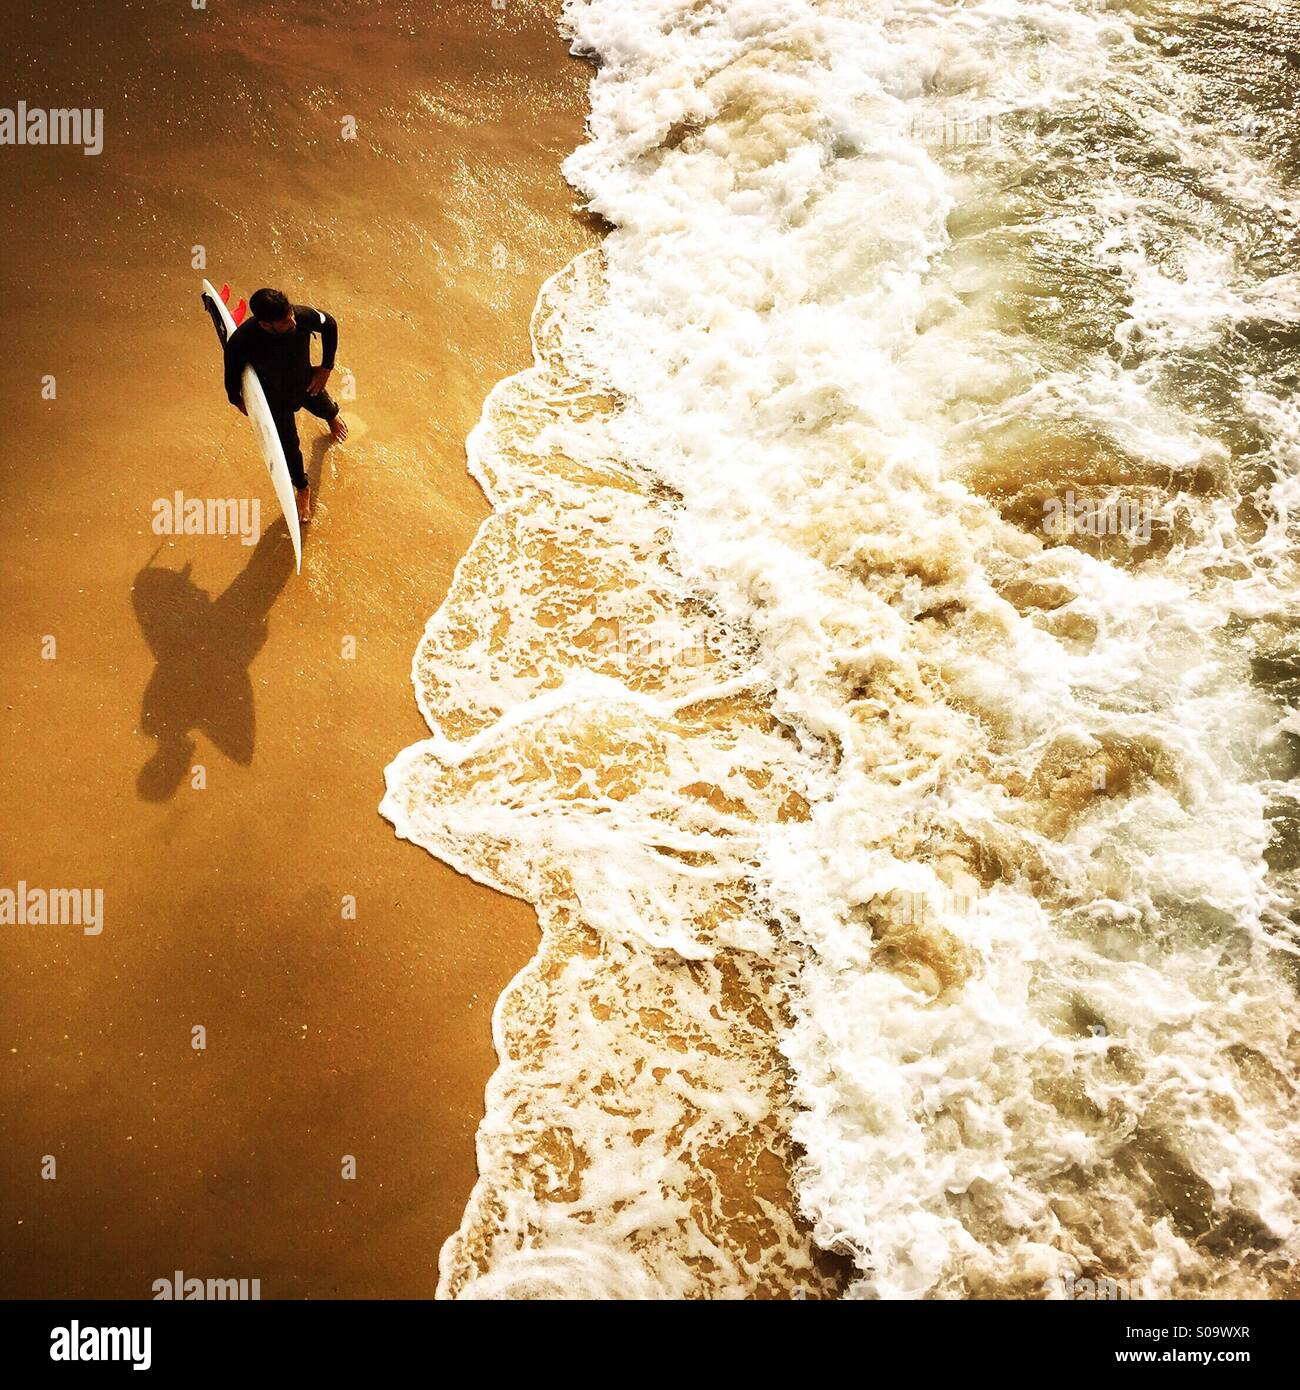 A surfer waits at the shoreline to surf. Manhattan Beach, California USA. Stock Photo